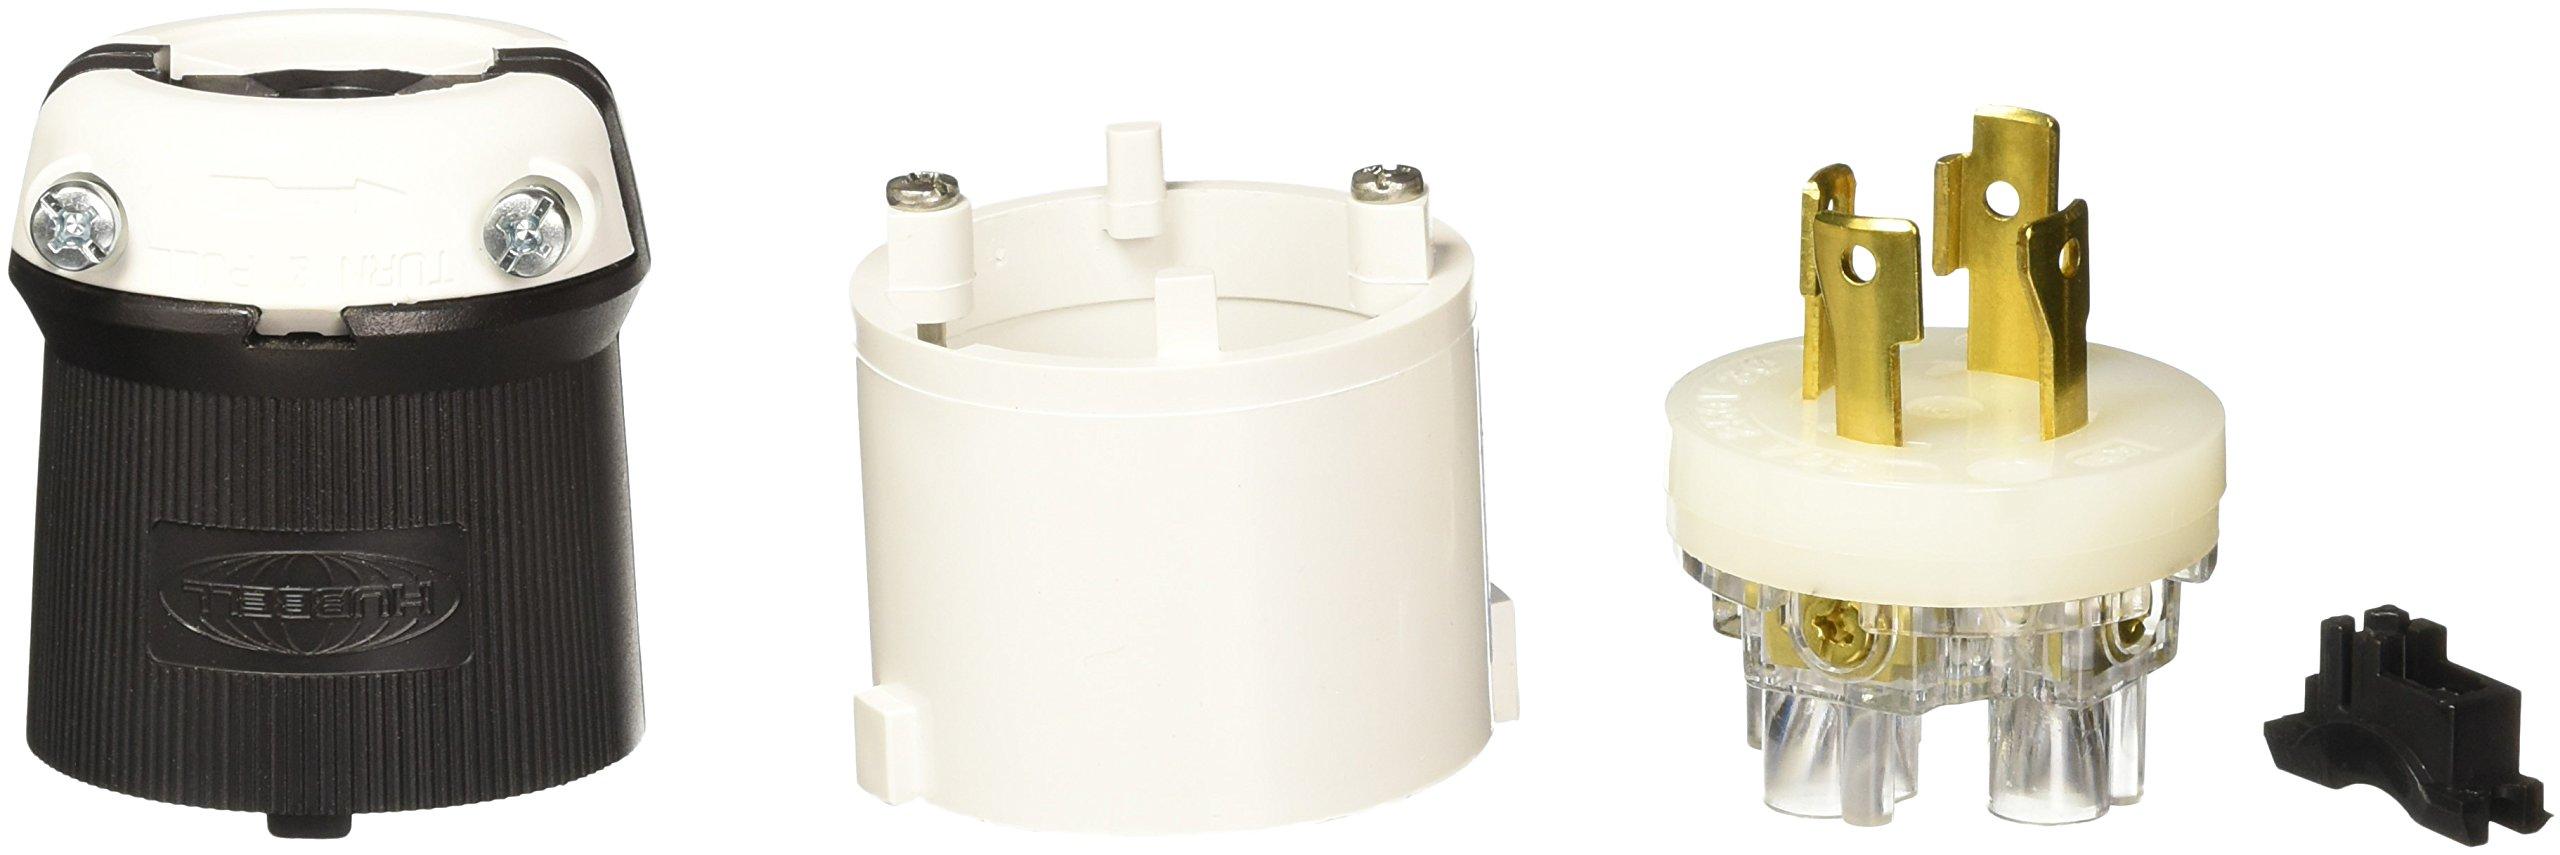 Hubbell HBL2721S Locking Safety Shroud Plug, 30 amp, 3 Phase, 250V, L15-30P